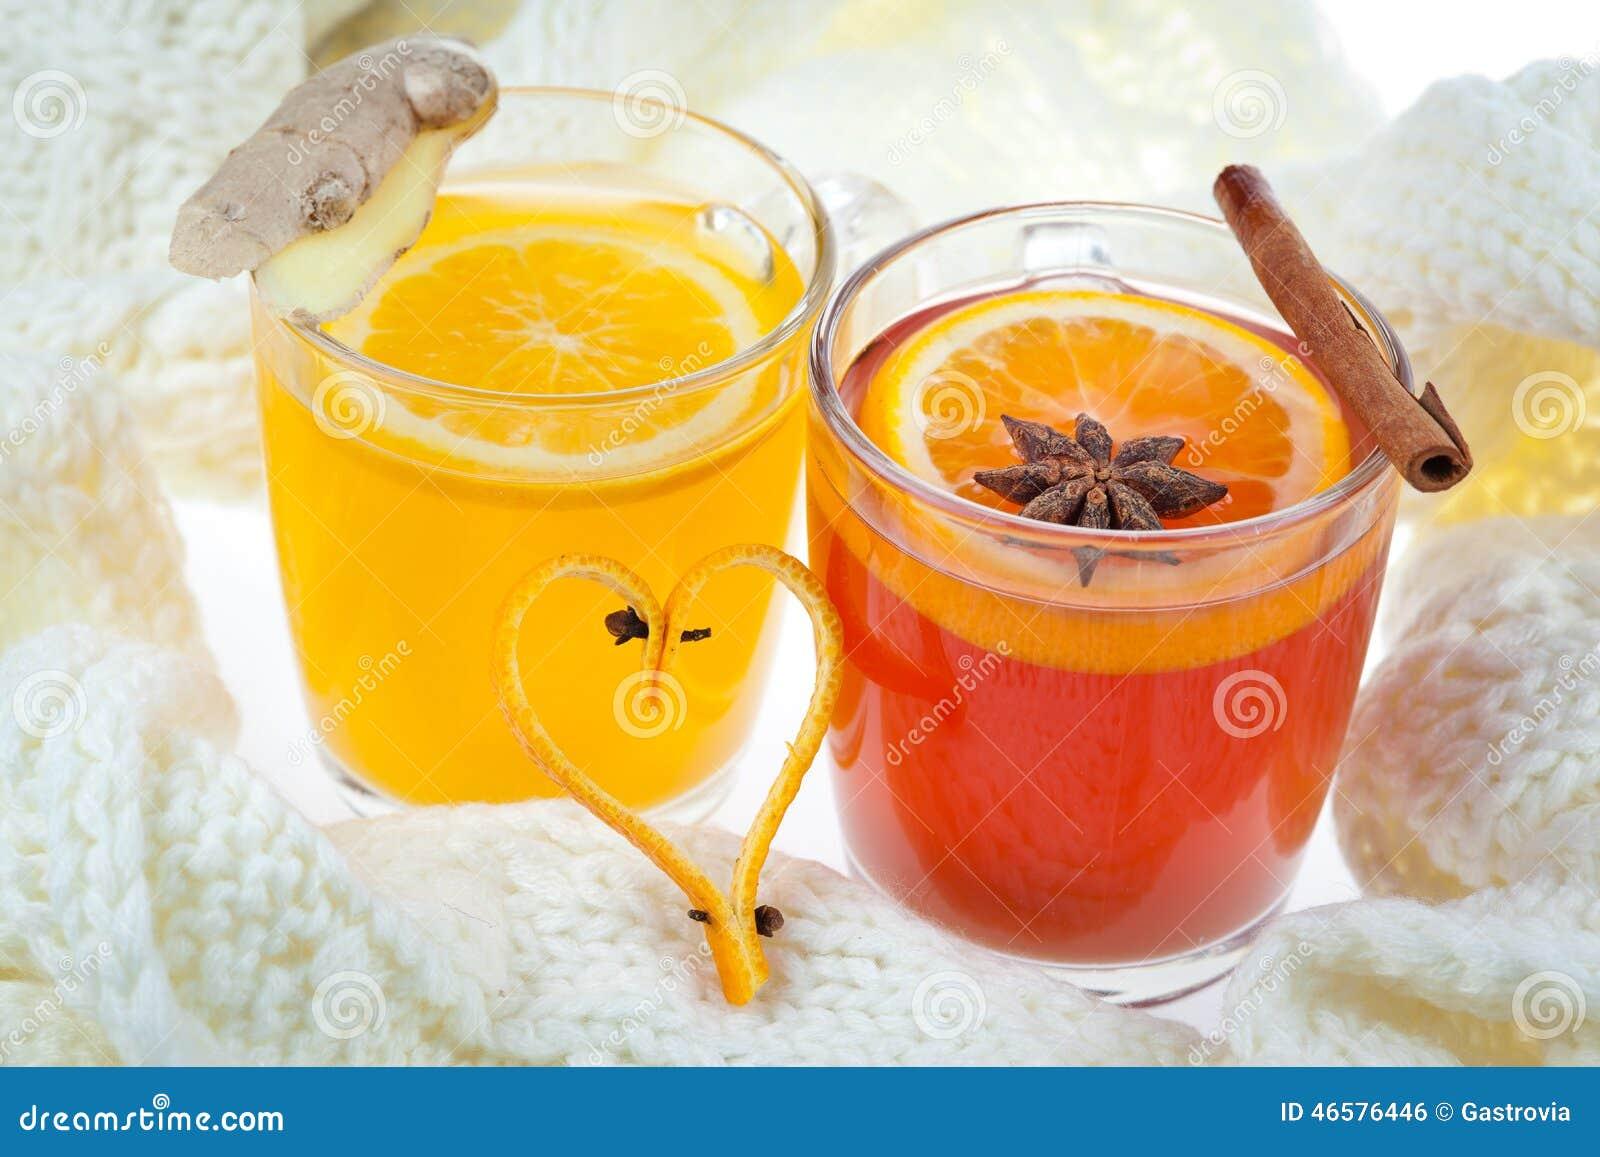 Perfurador quente e bebida alaranjada